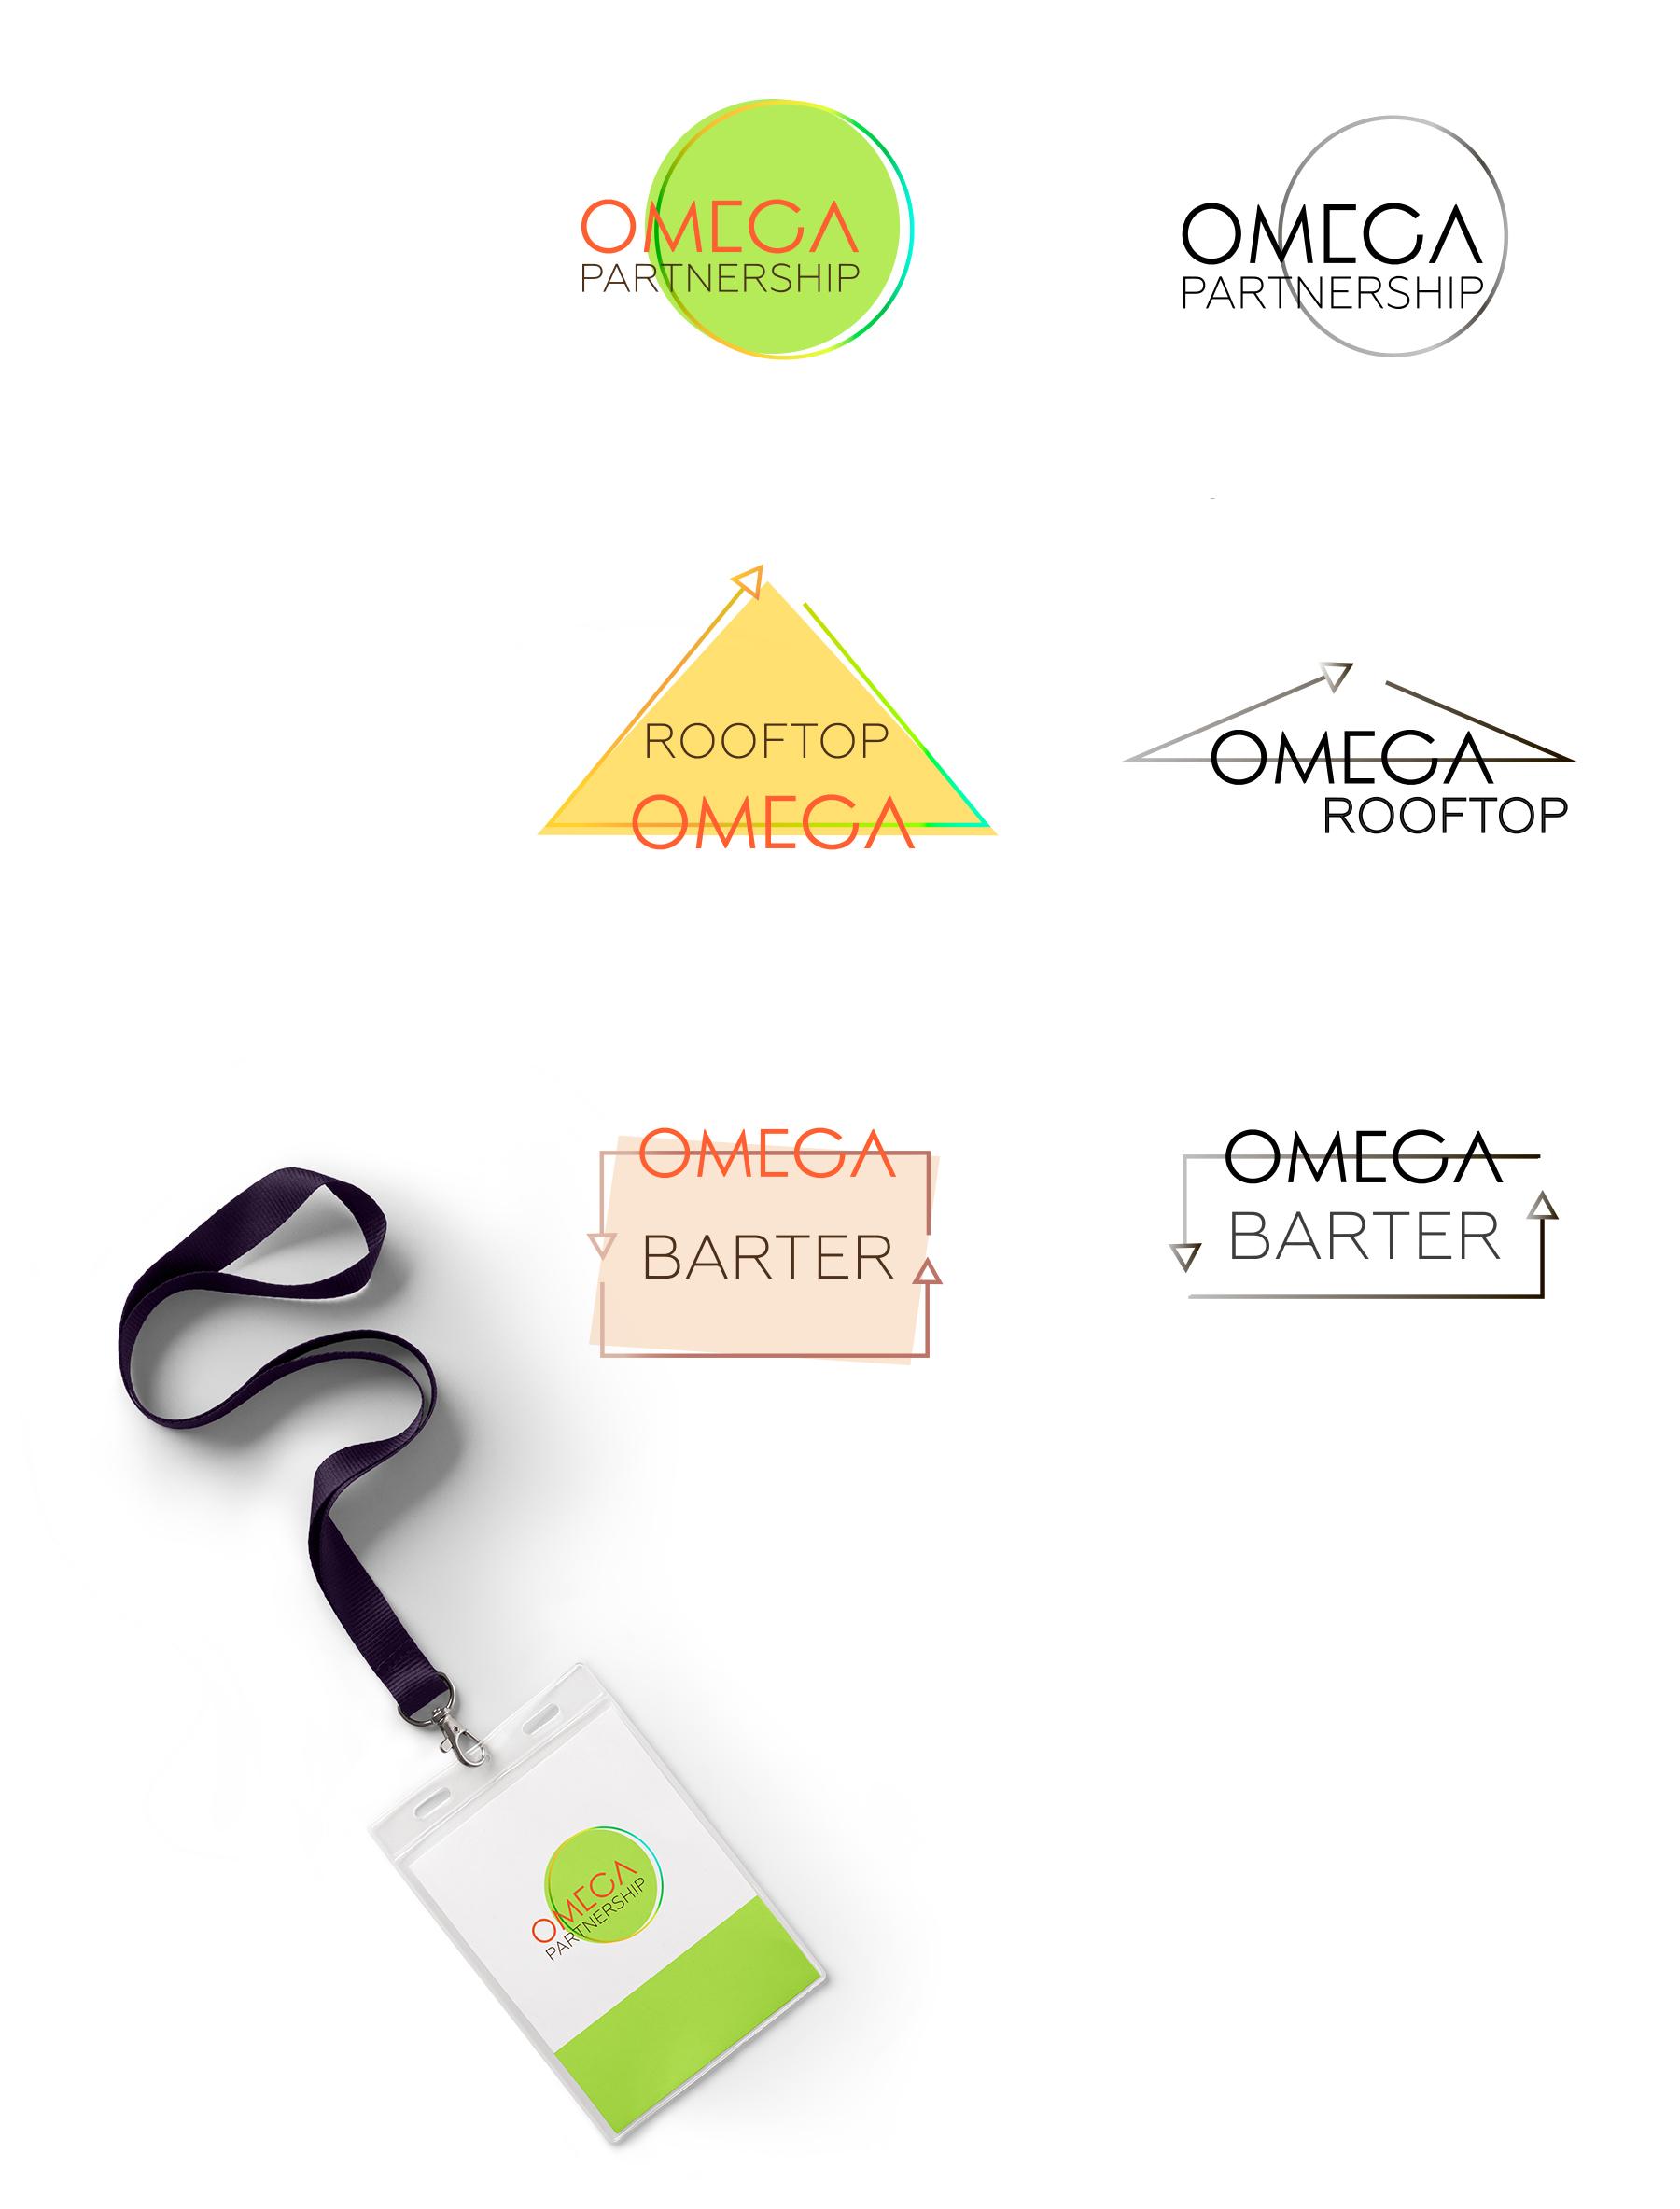 Придумать концепцию логотипа группы компаний фото f_9435b744a4ba2988.jpg